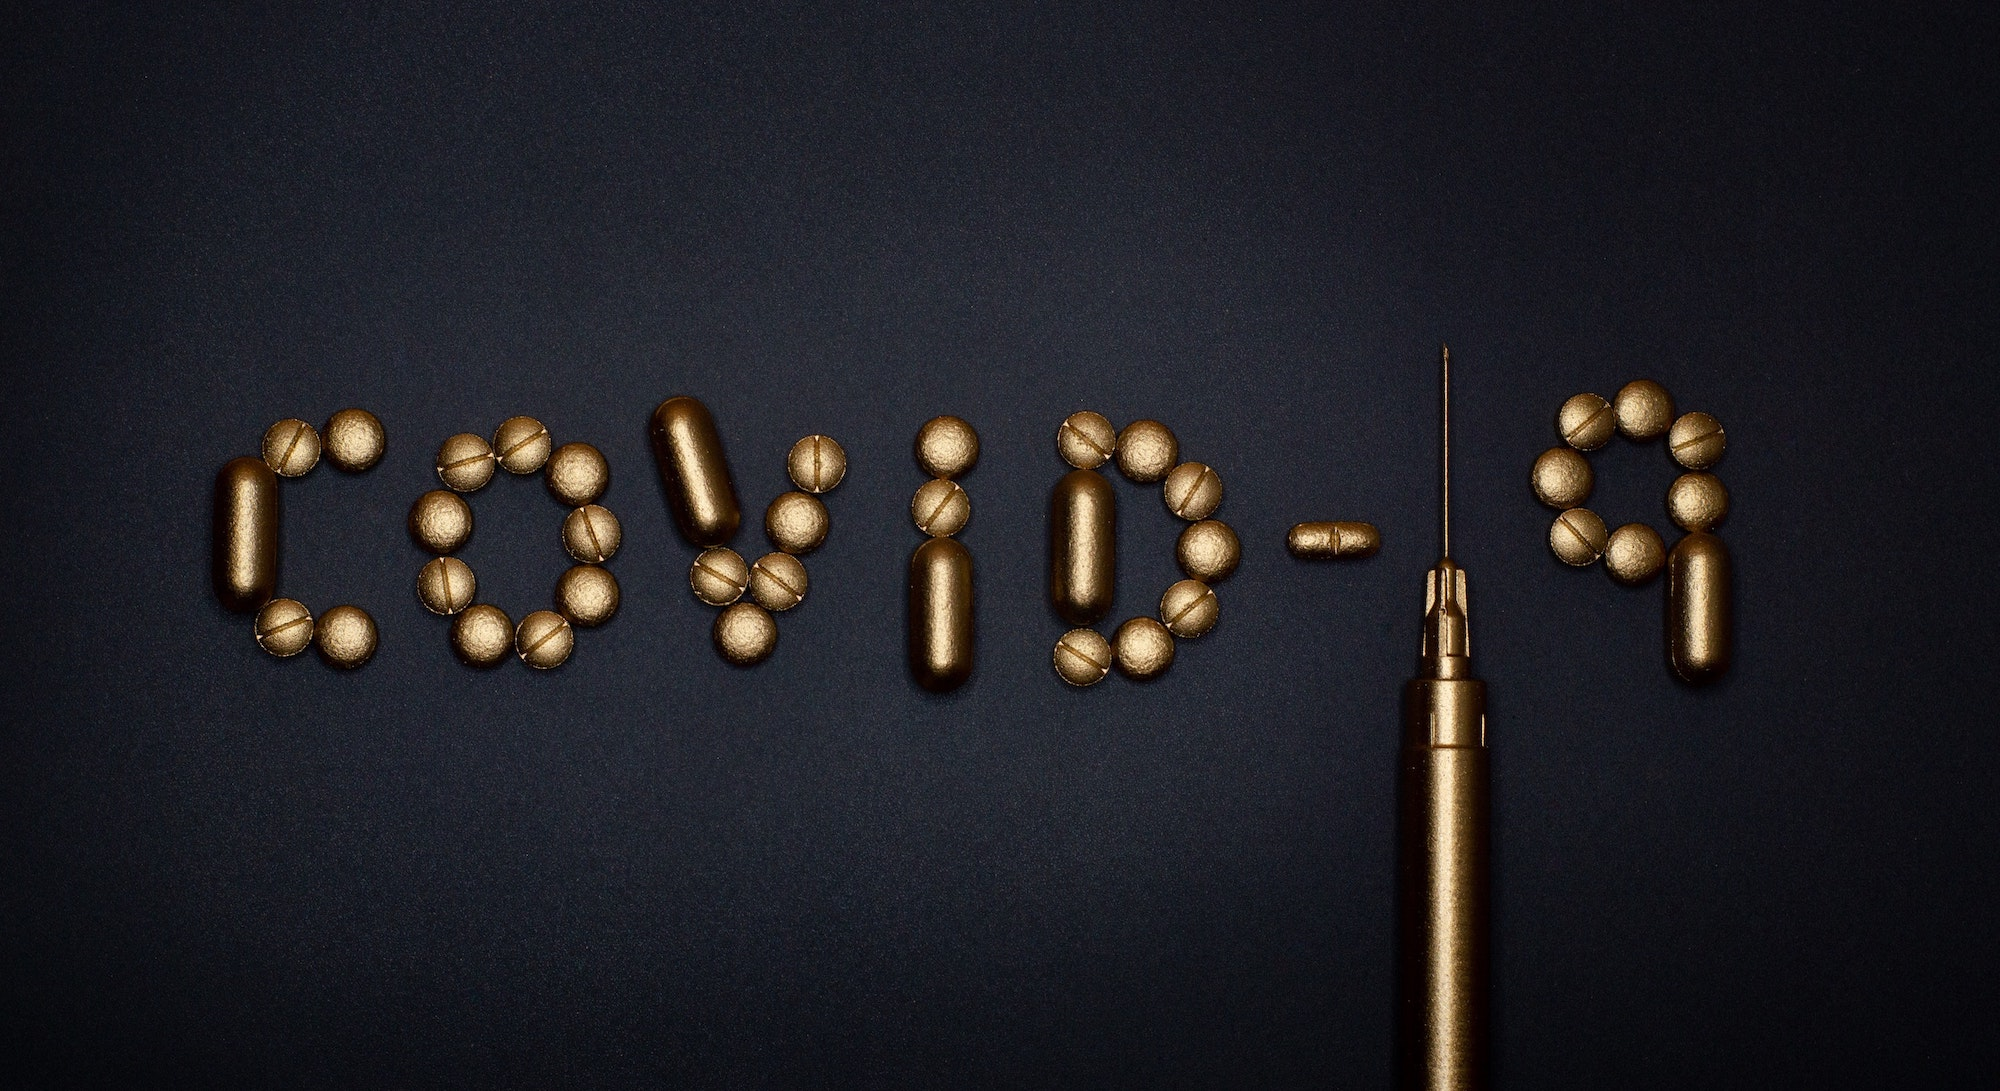 Protokół profilaktyki i leczenia COVID-19